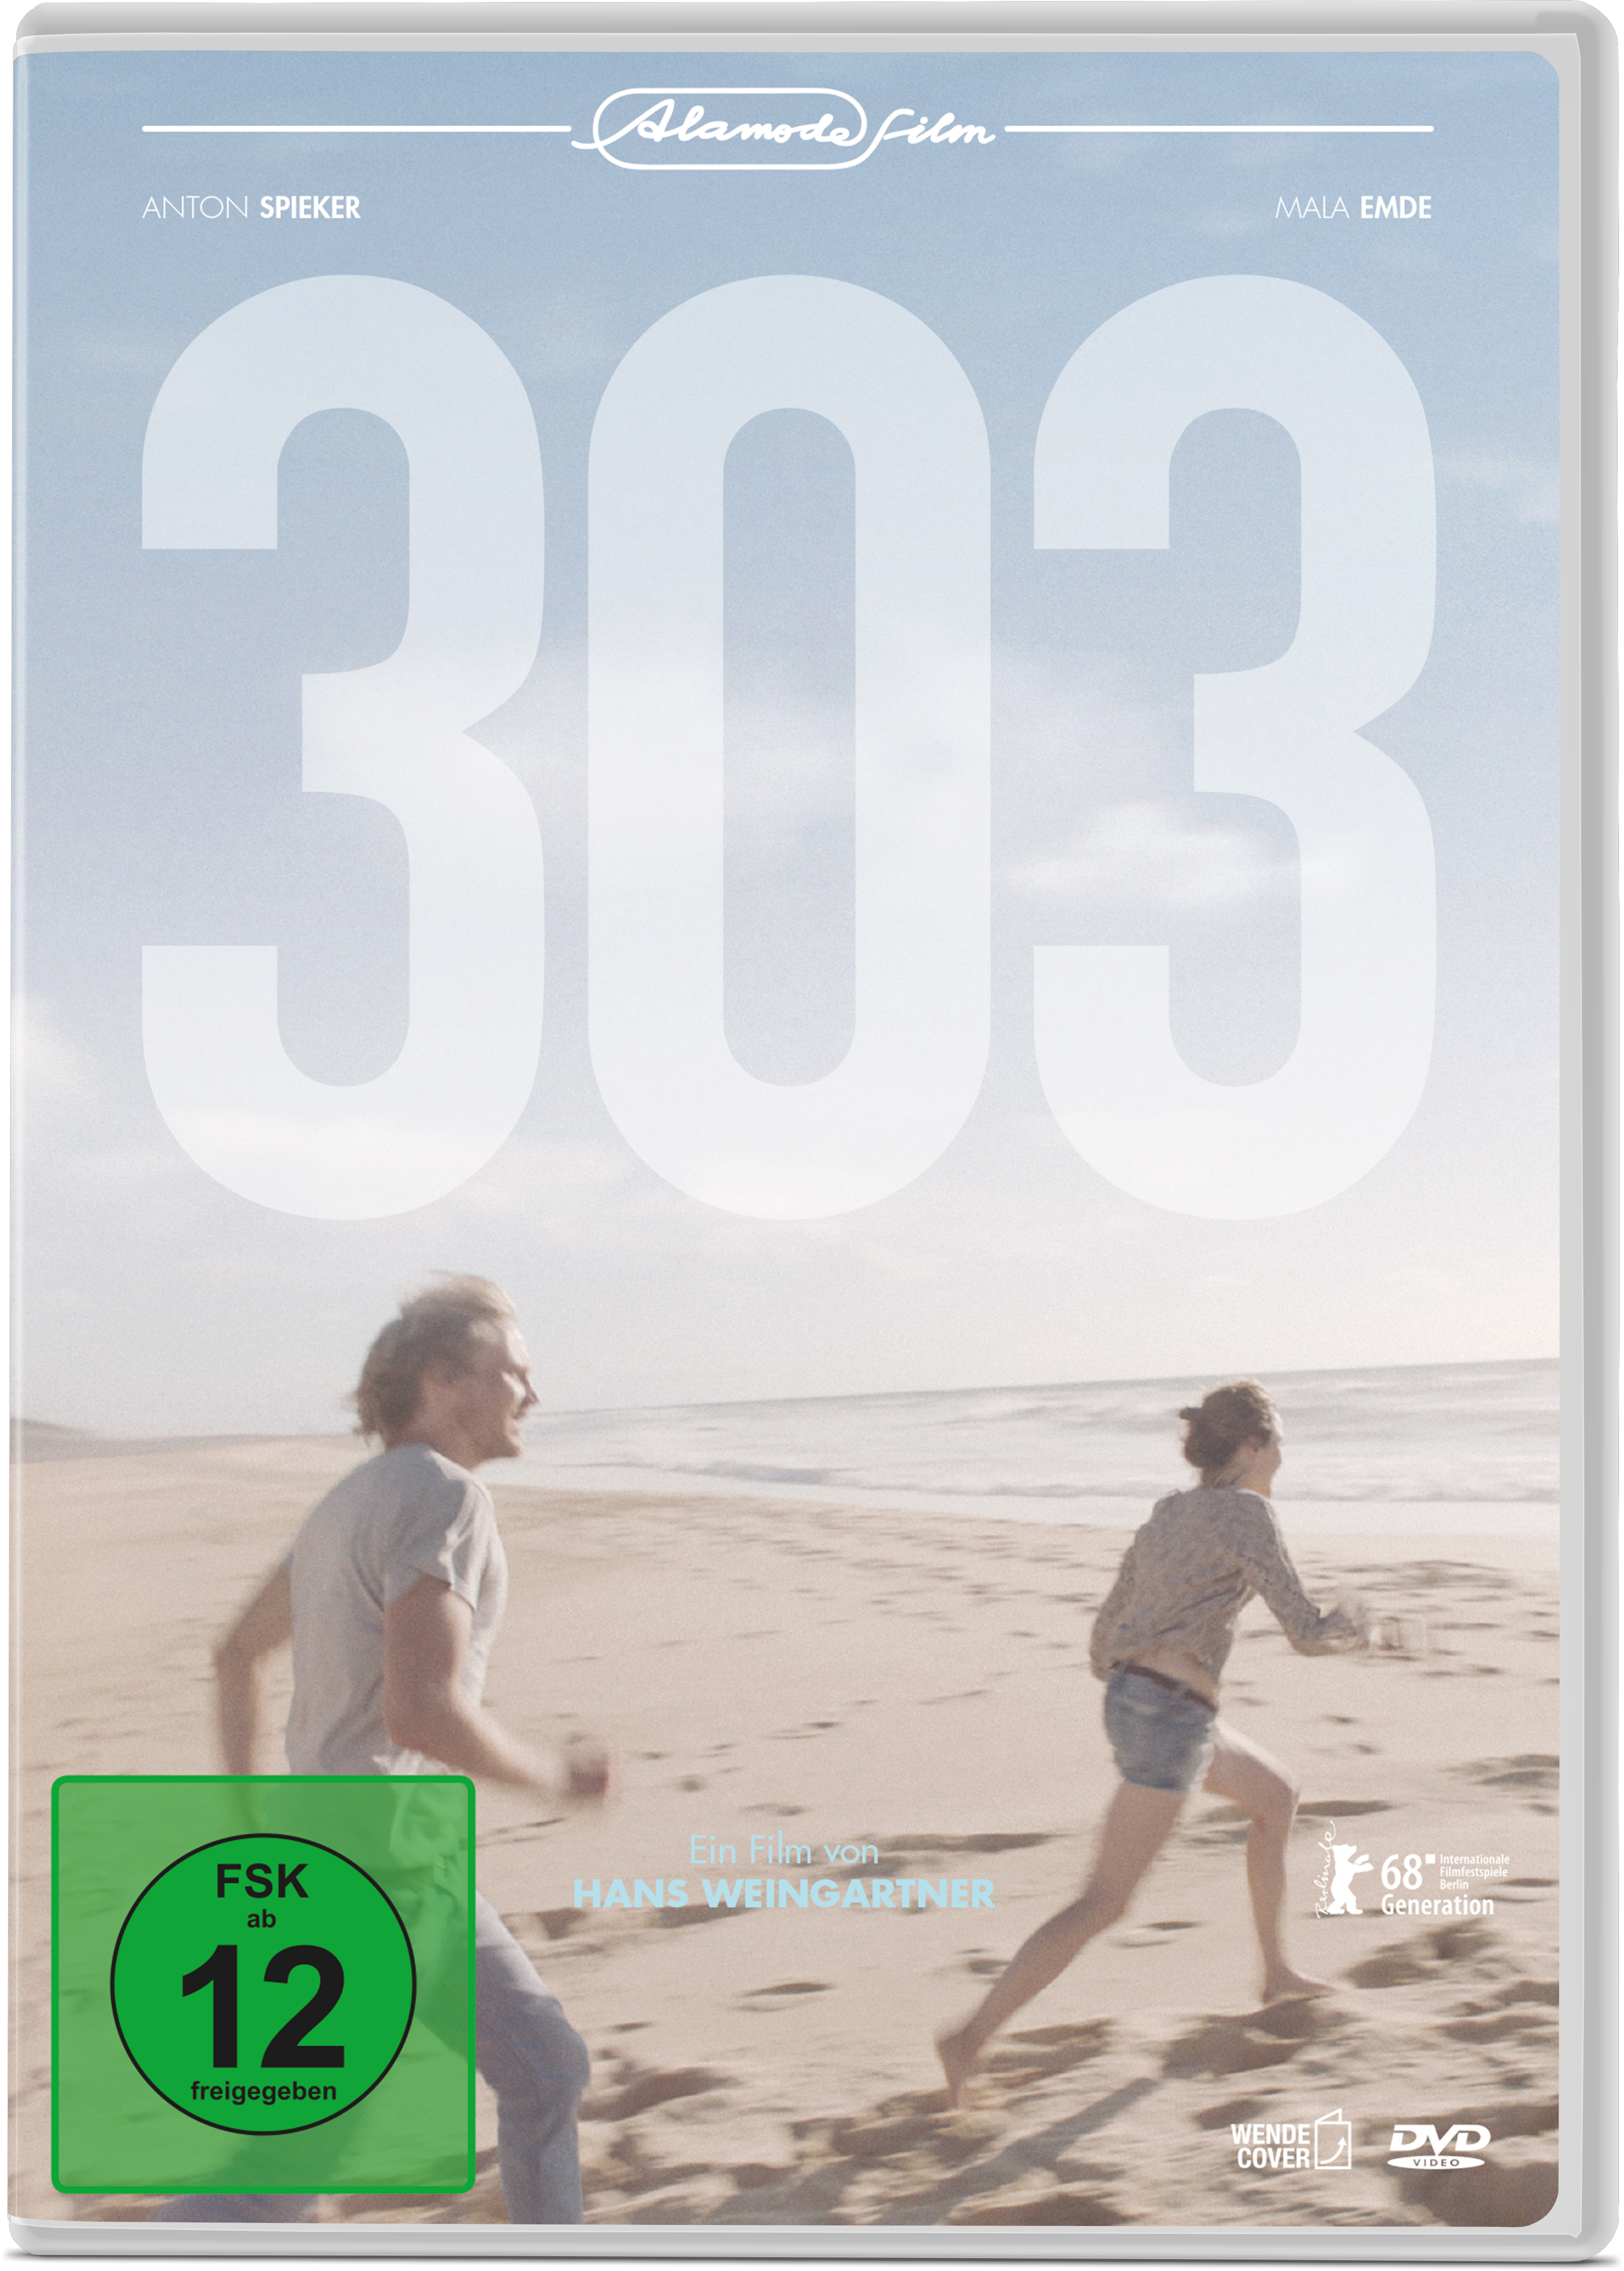 303 DVD